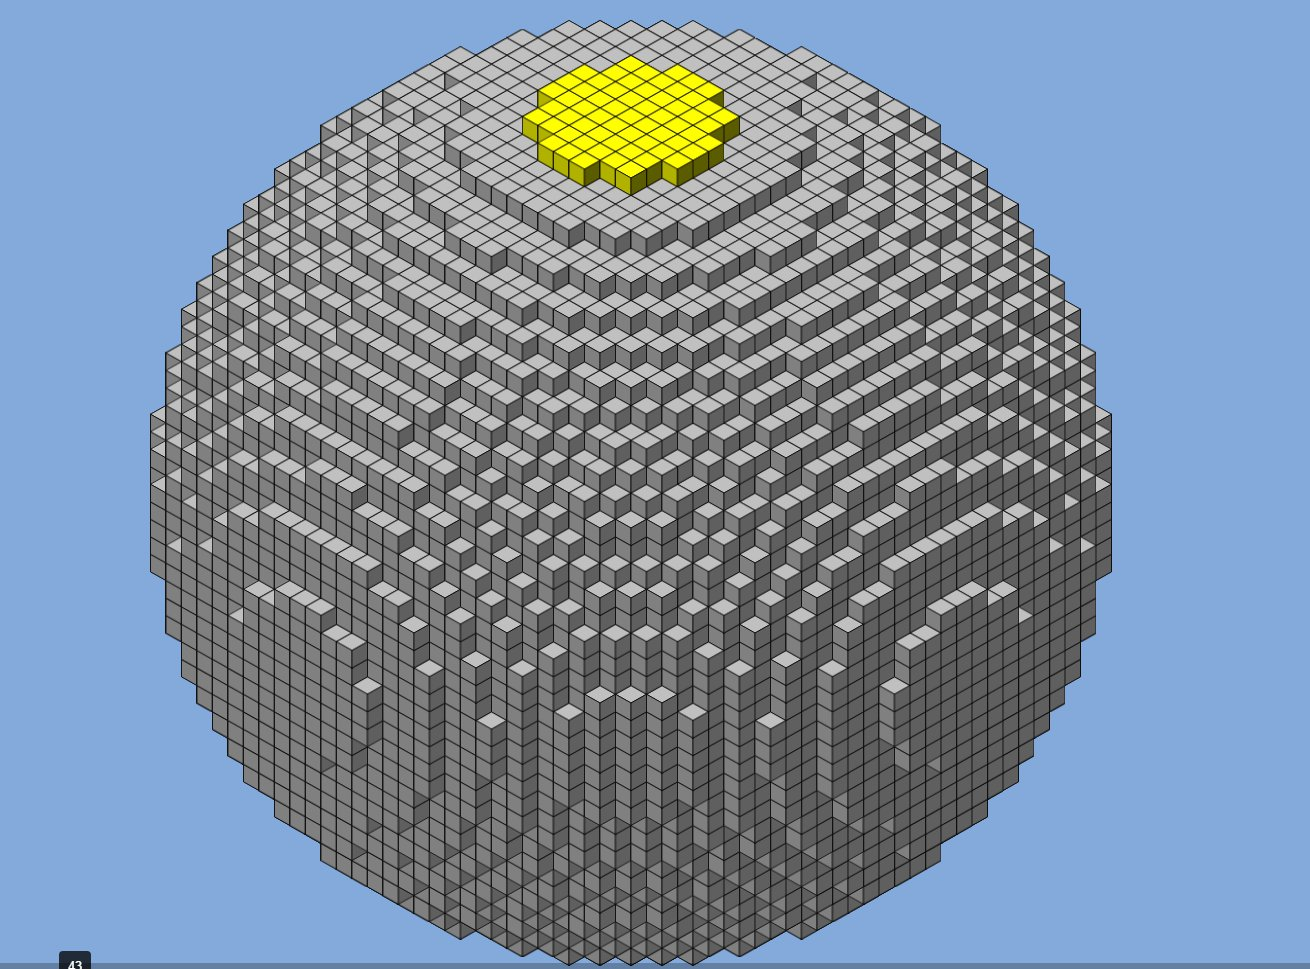 Perfect Minecraft Circle Diagram Craftsman Garage Door Safety Sensor Wiring Gry Lego Mmorpg Strategiczne I Wiele Innych Projekt